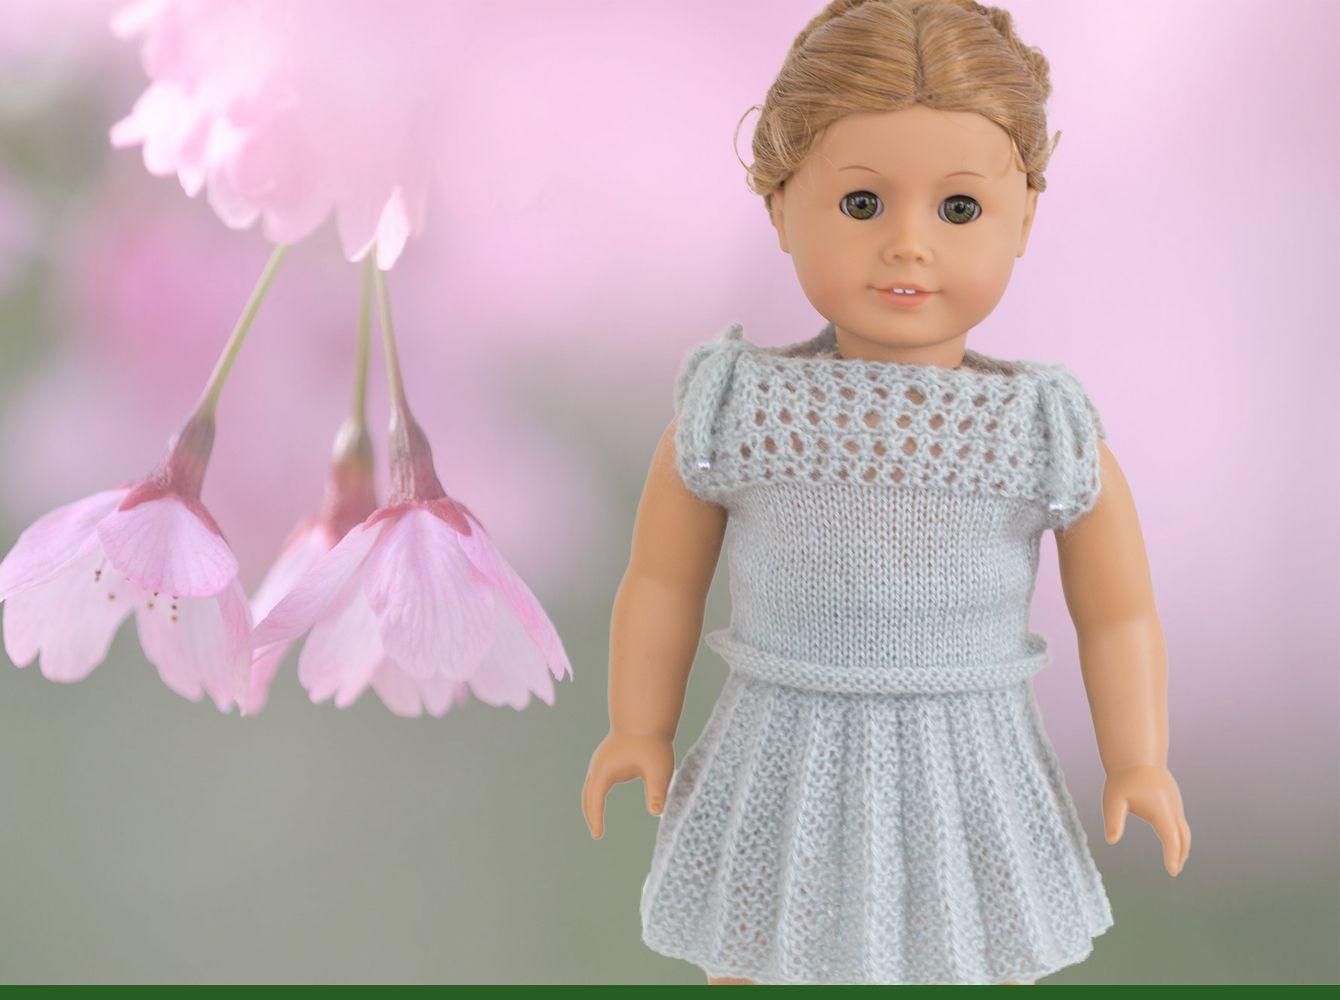 Knitting Pattern for American Girl dolls Plisse skirt and top ...